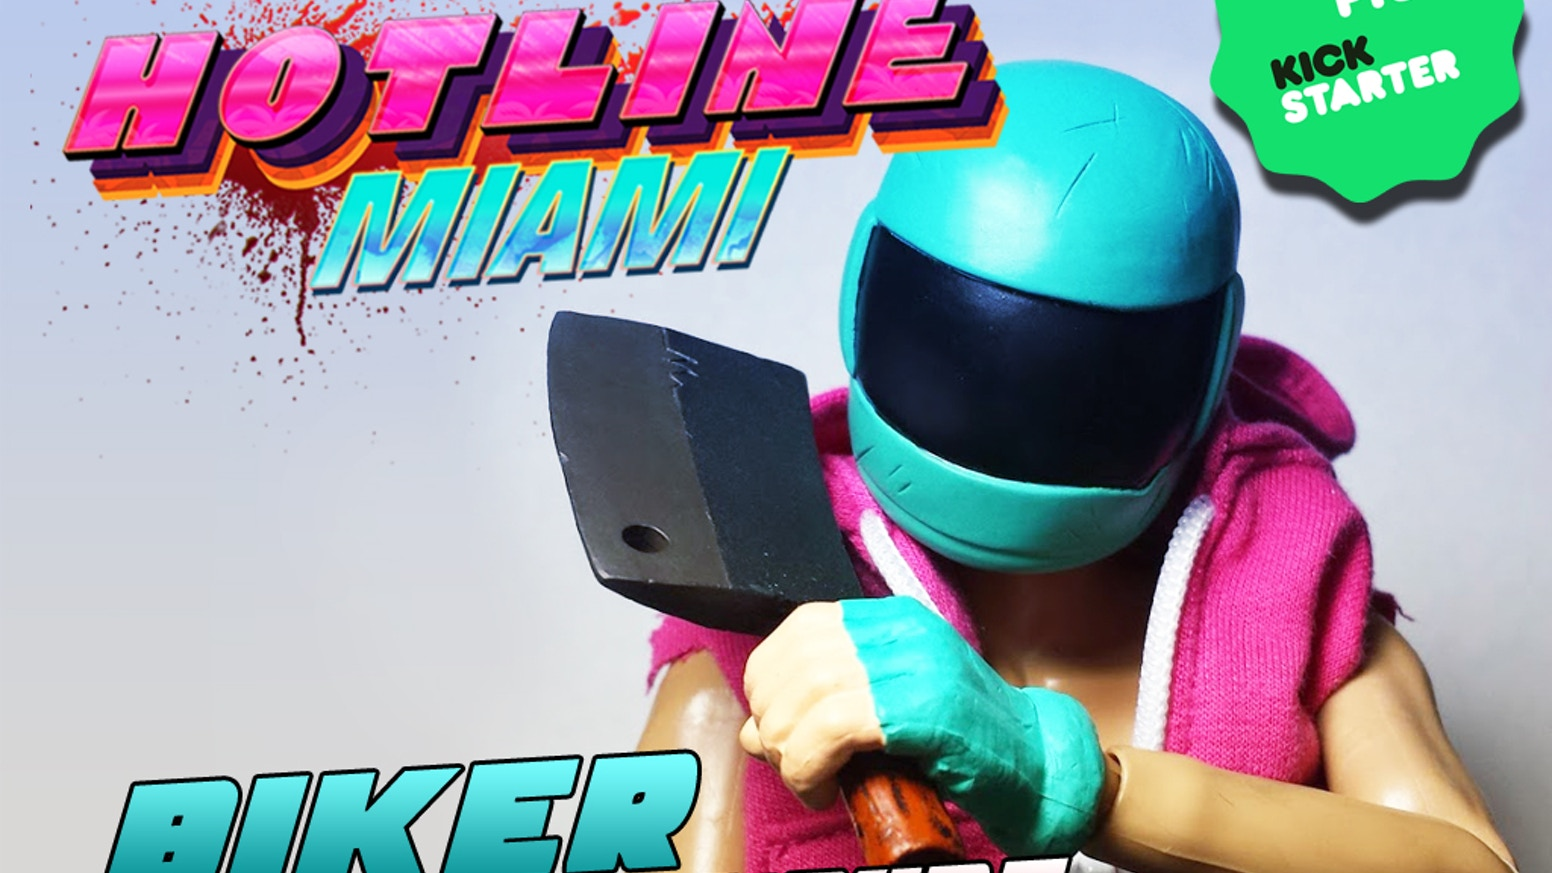 "Second 1/6 scale ""12 inch"" Hotline Miami BIKER figure by Dennaton, Devolver Digital and esctoy.com. Second figure in the series."